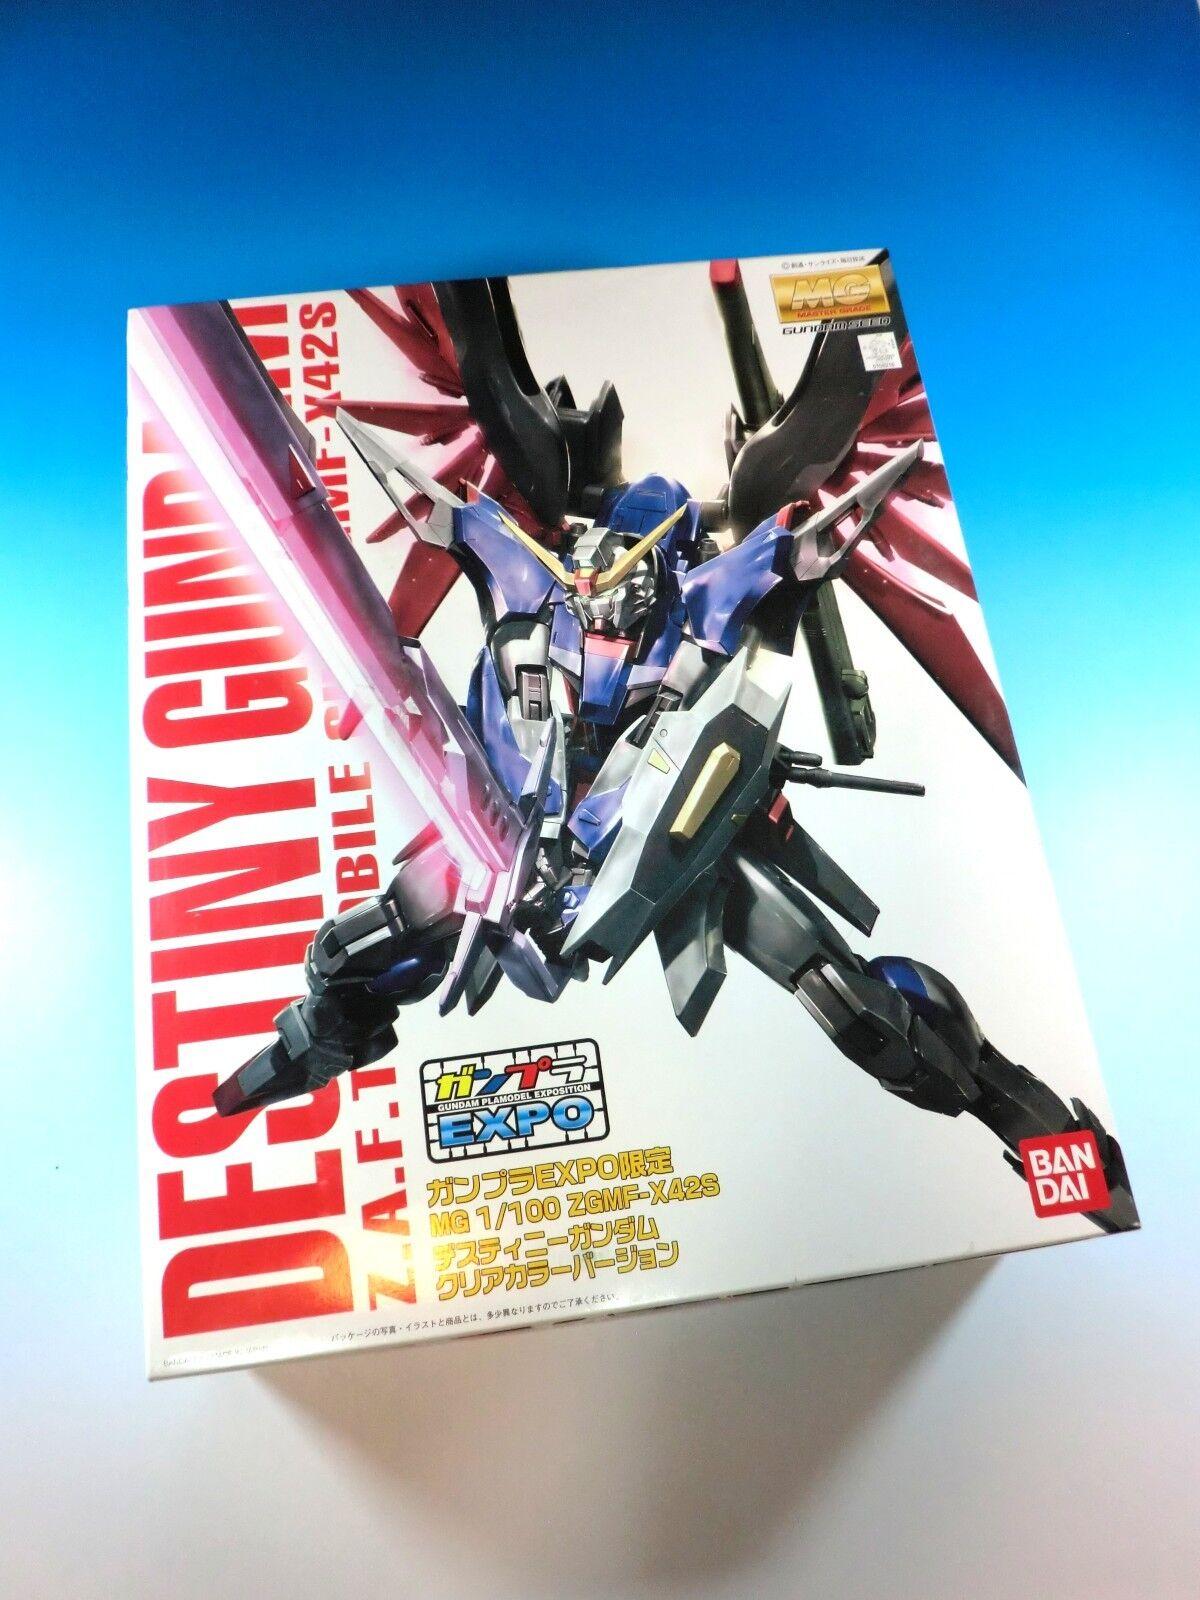 Gundam EXPO-limited MG 1 100 ZGMF-X42S Destiny Gundam Model Kits